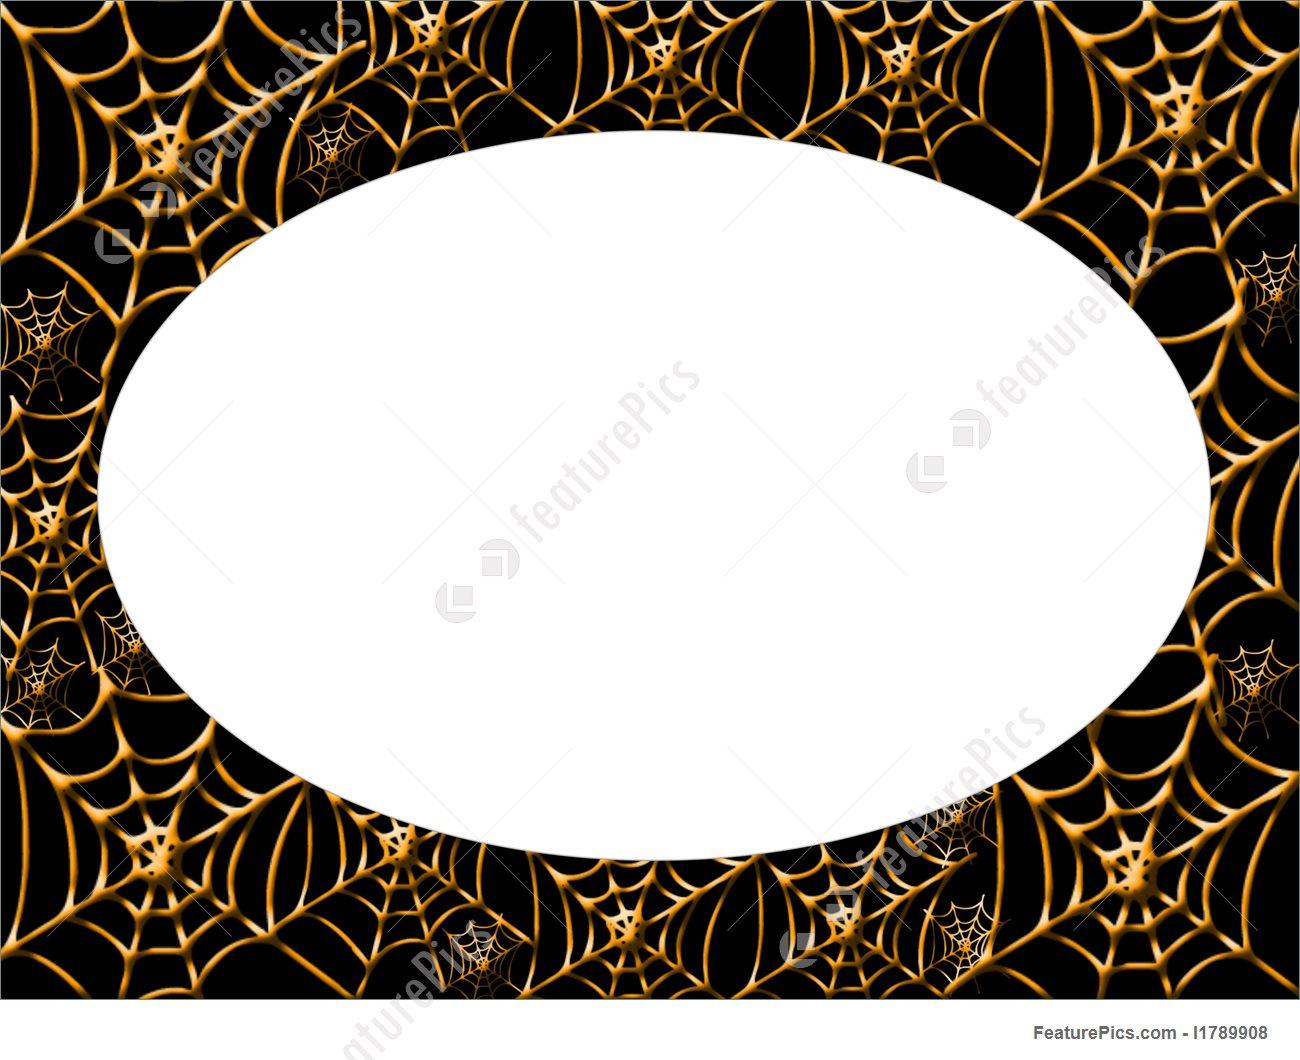 1300x1060 Halloween Spider Web Border Picture